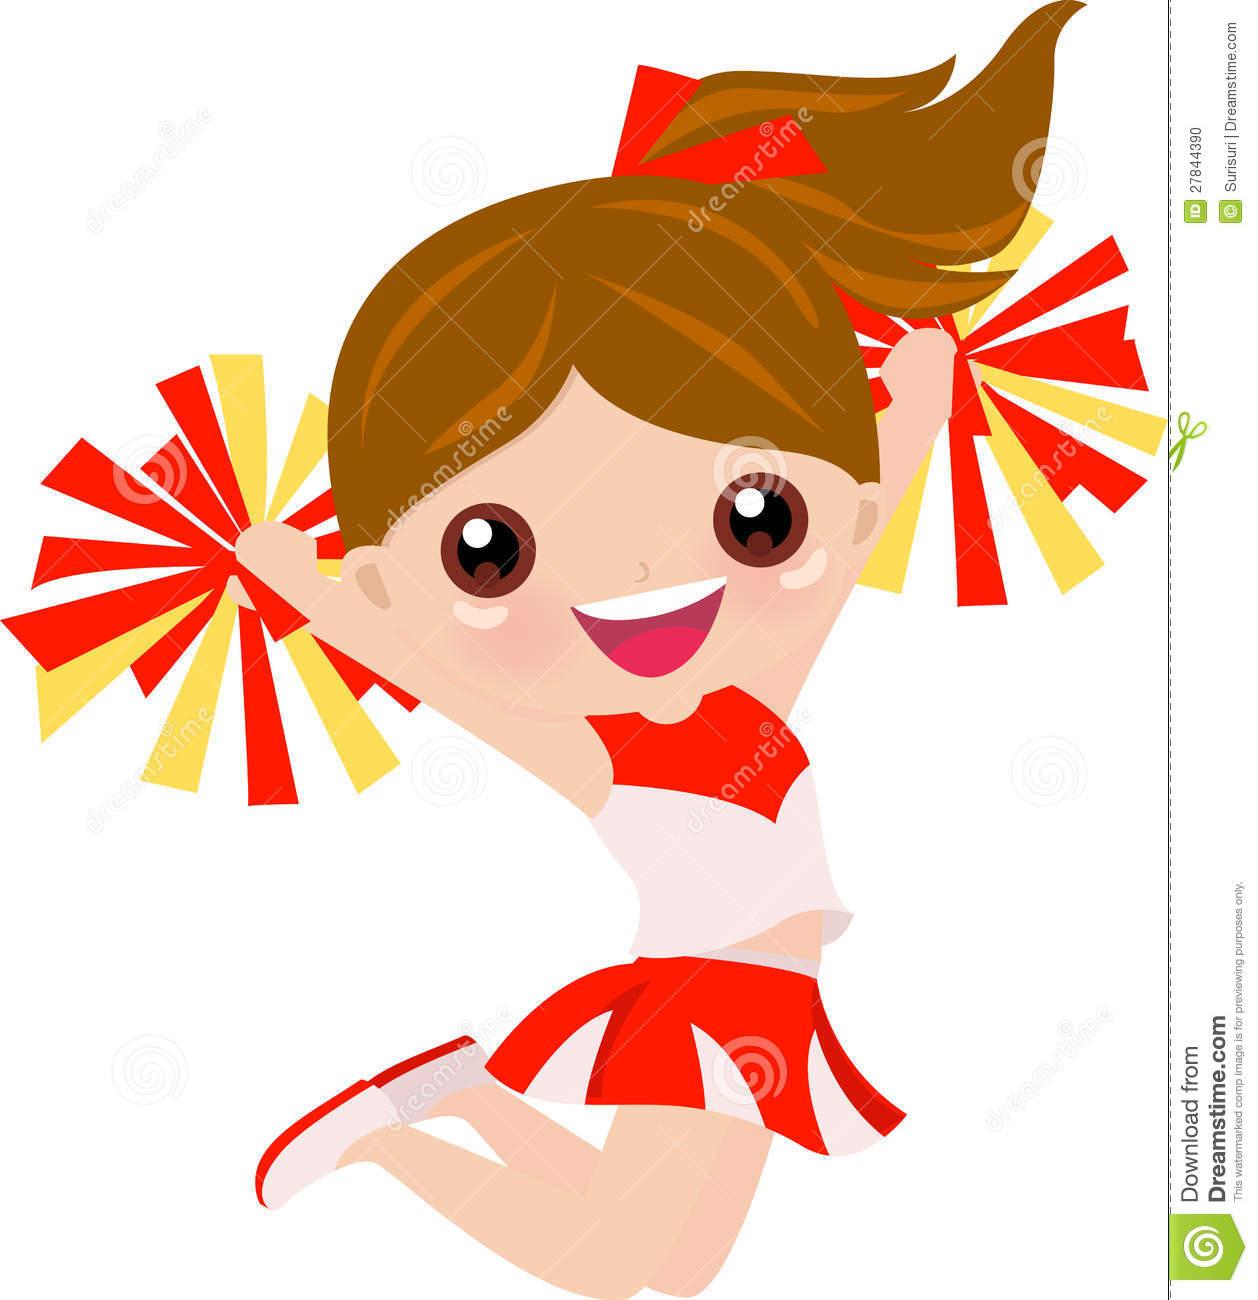 Cheerleading images free download. Cheer clipart cartoon